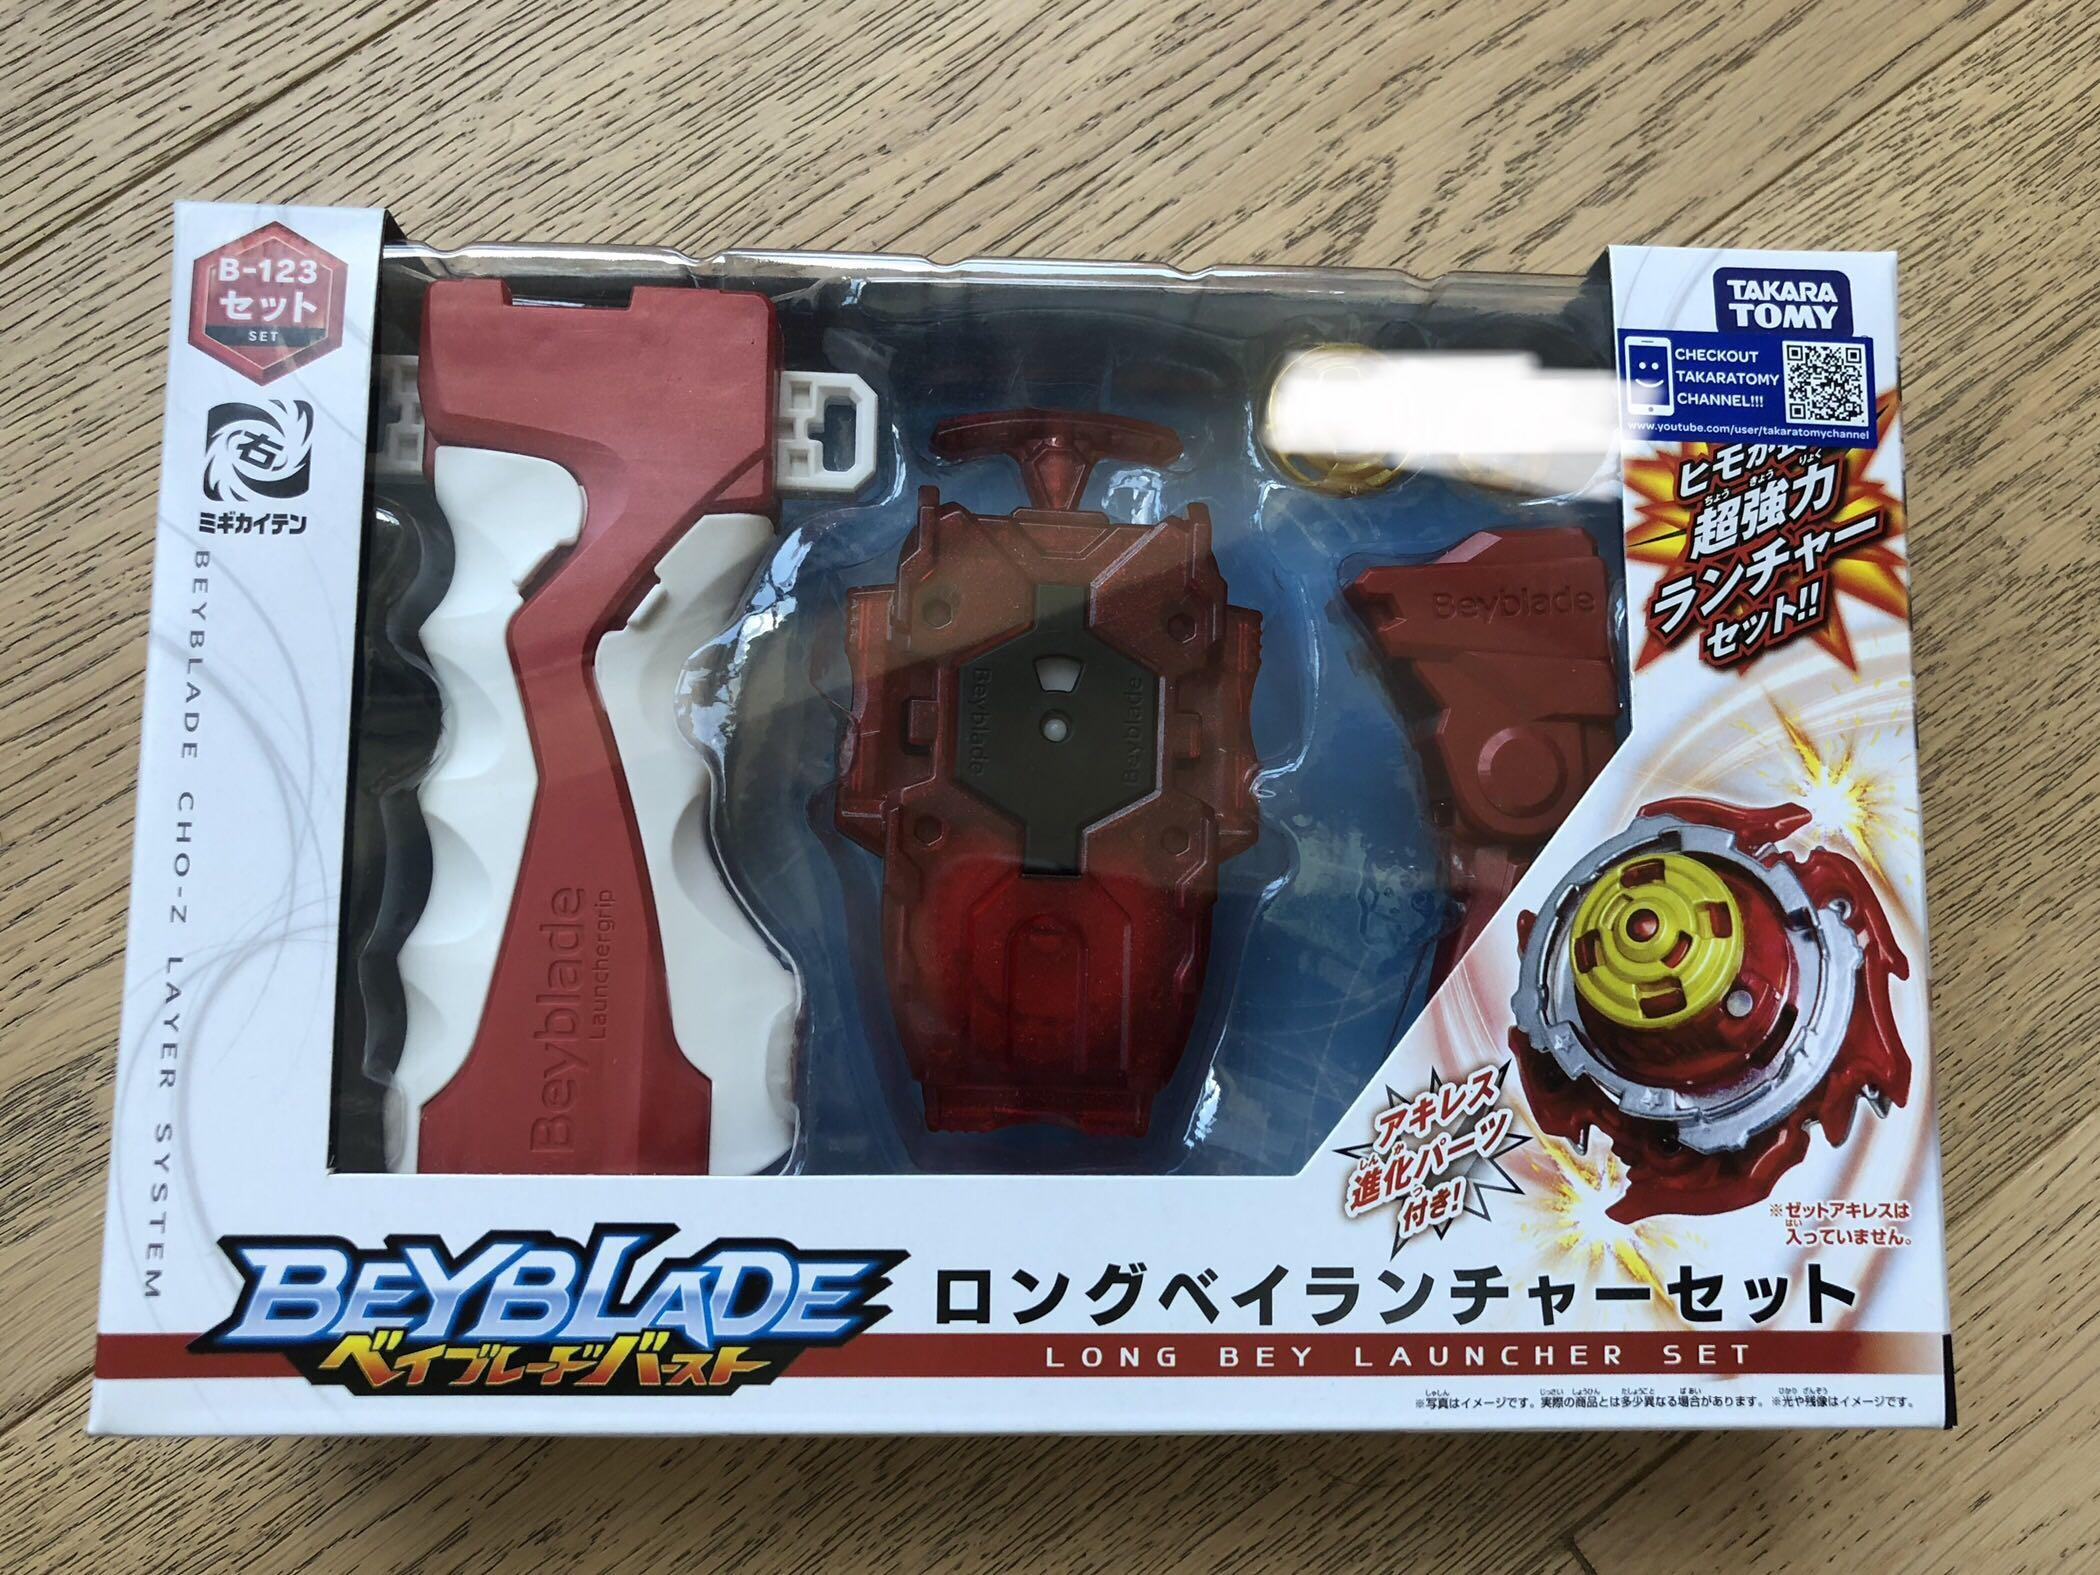 Beyblade B123 Long Bey Launcher set